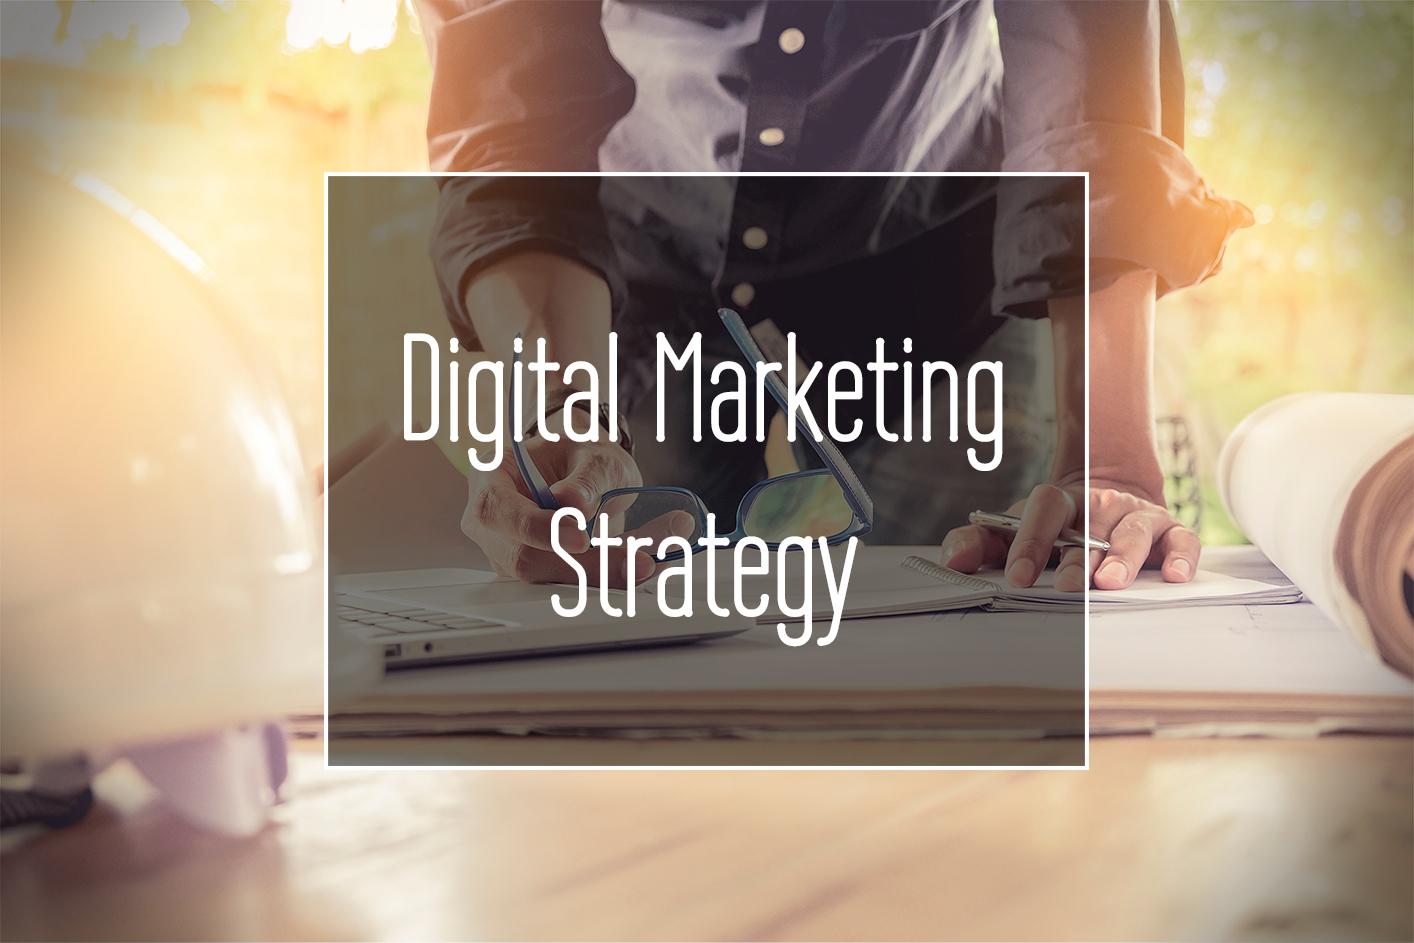 Digital Marketing Strategy for Maximum Exposure